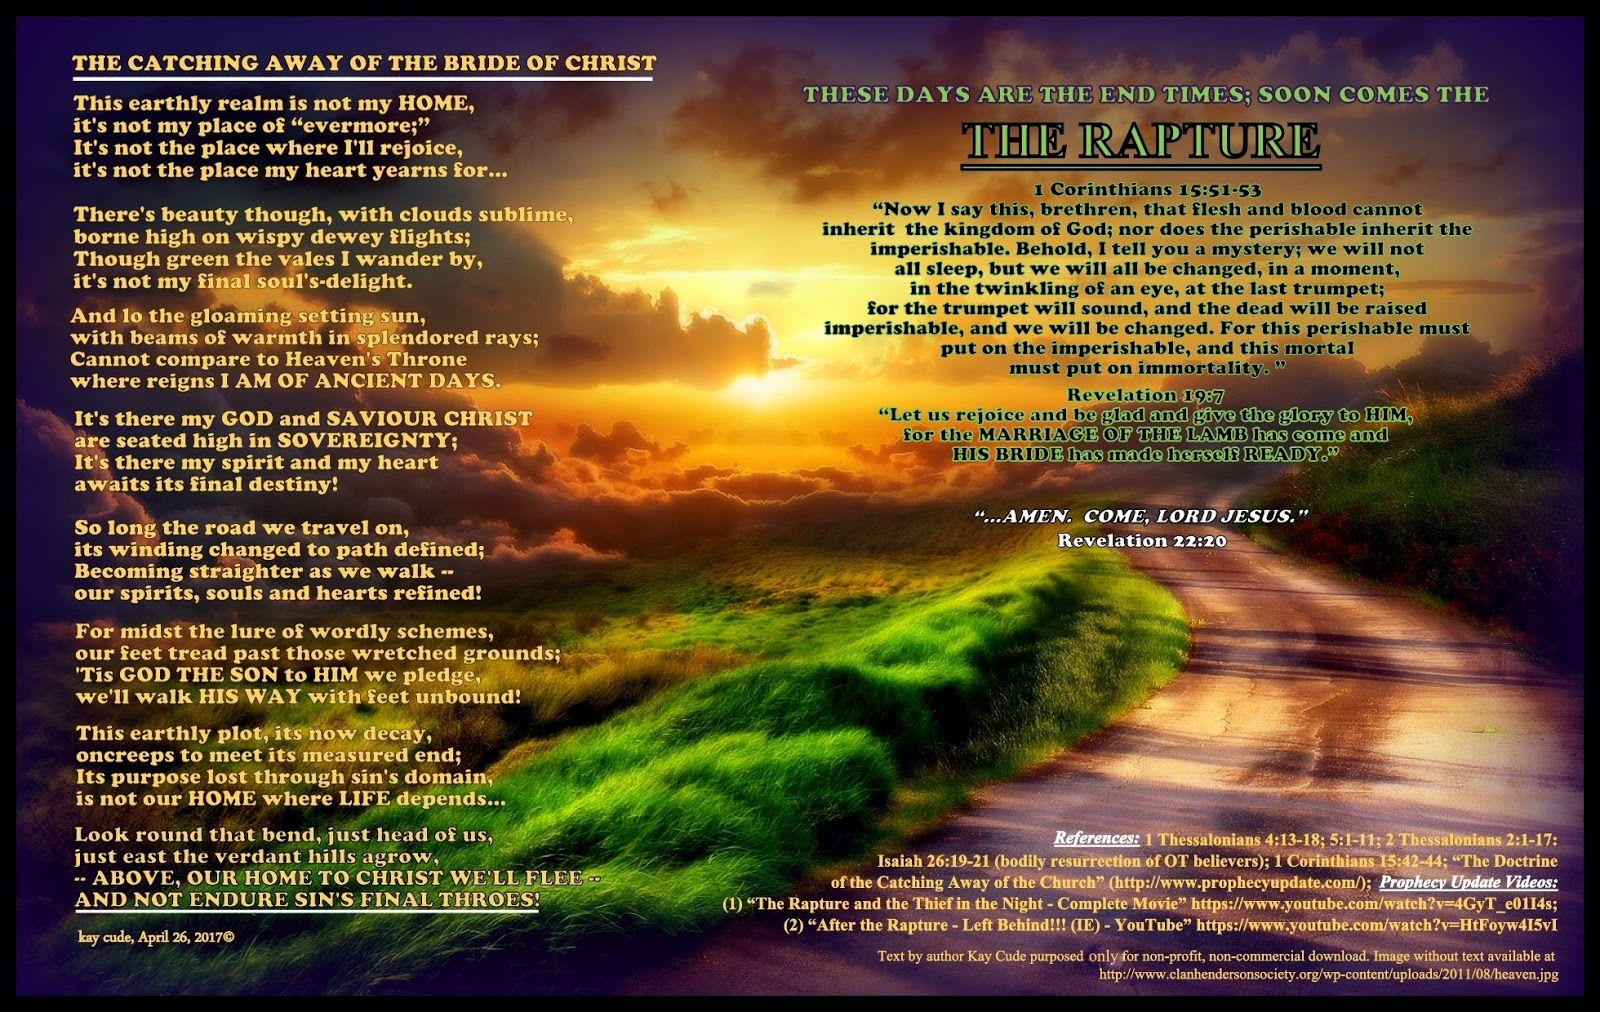 The rapture essay